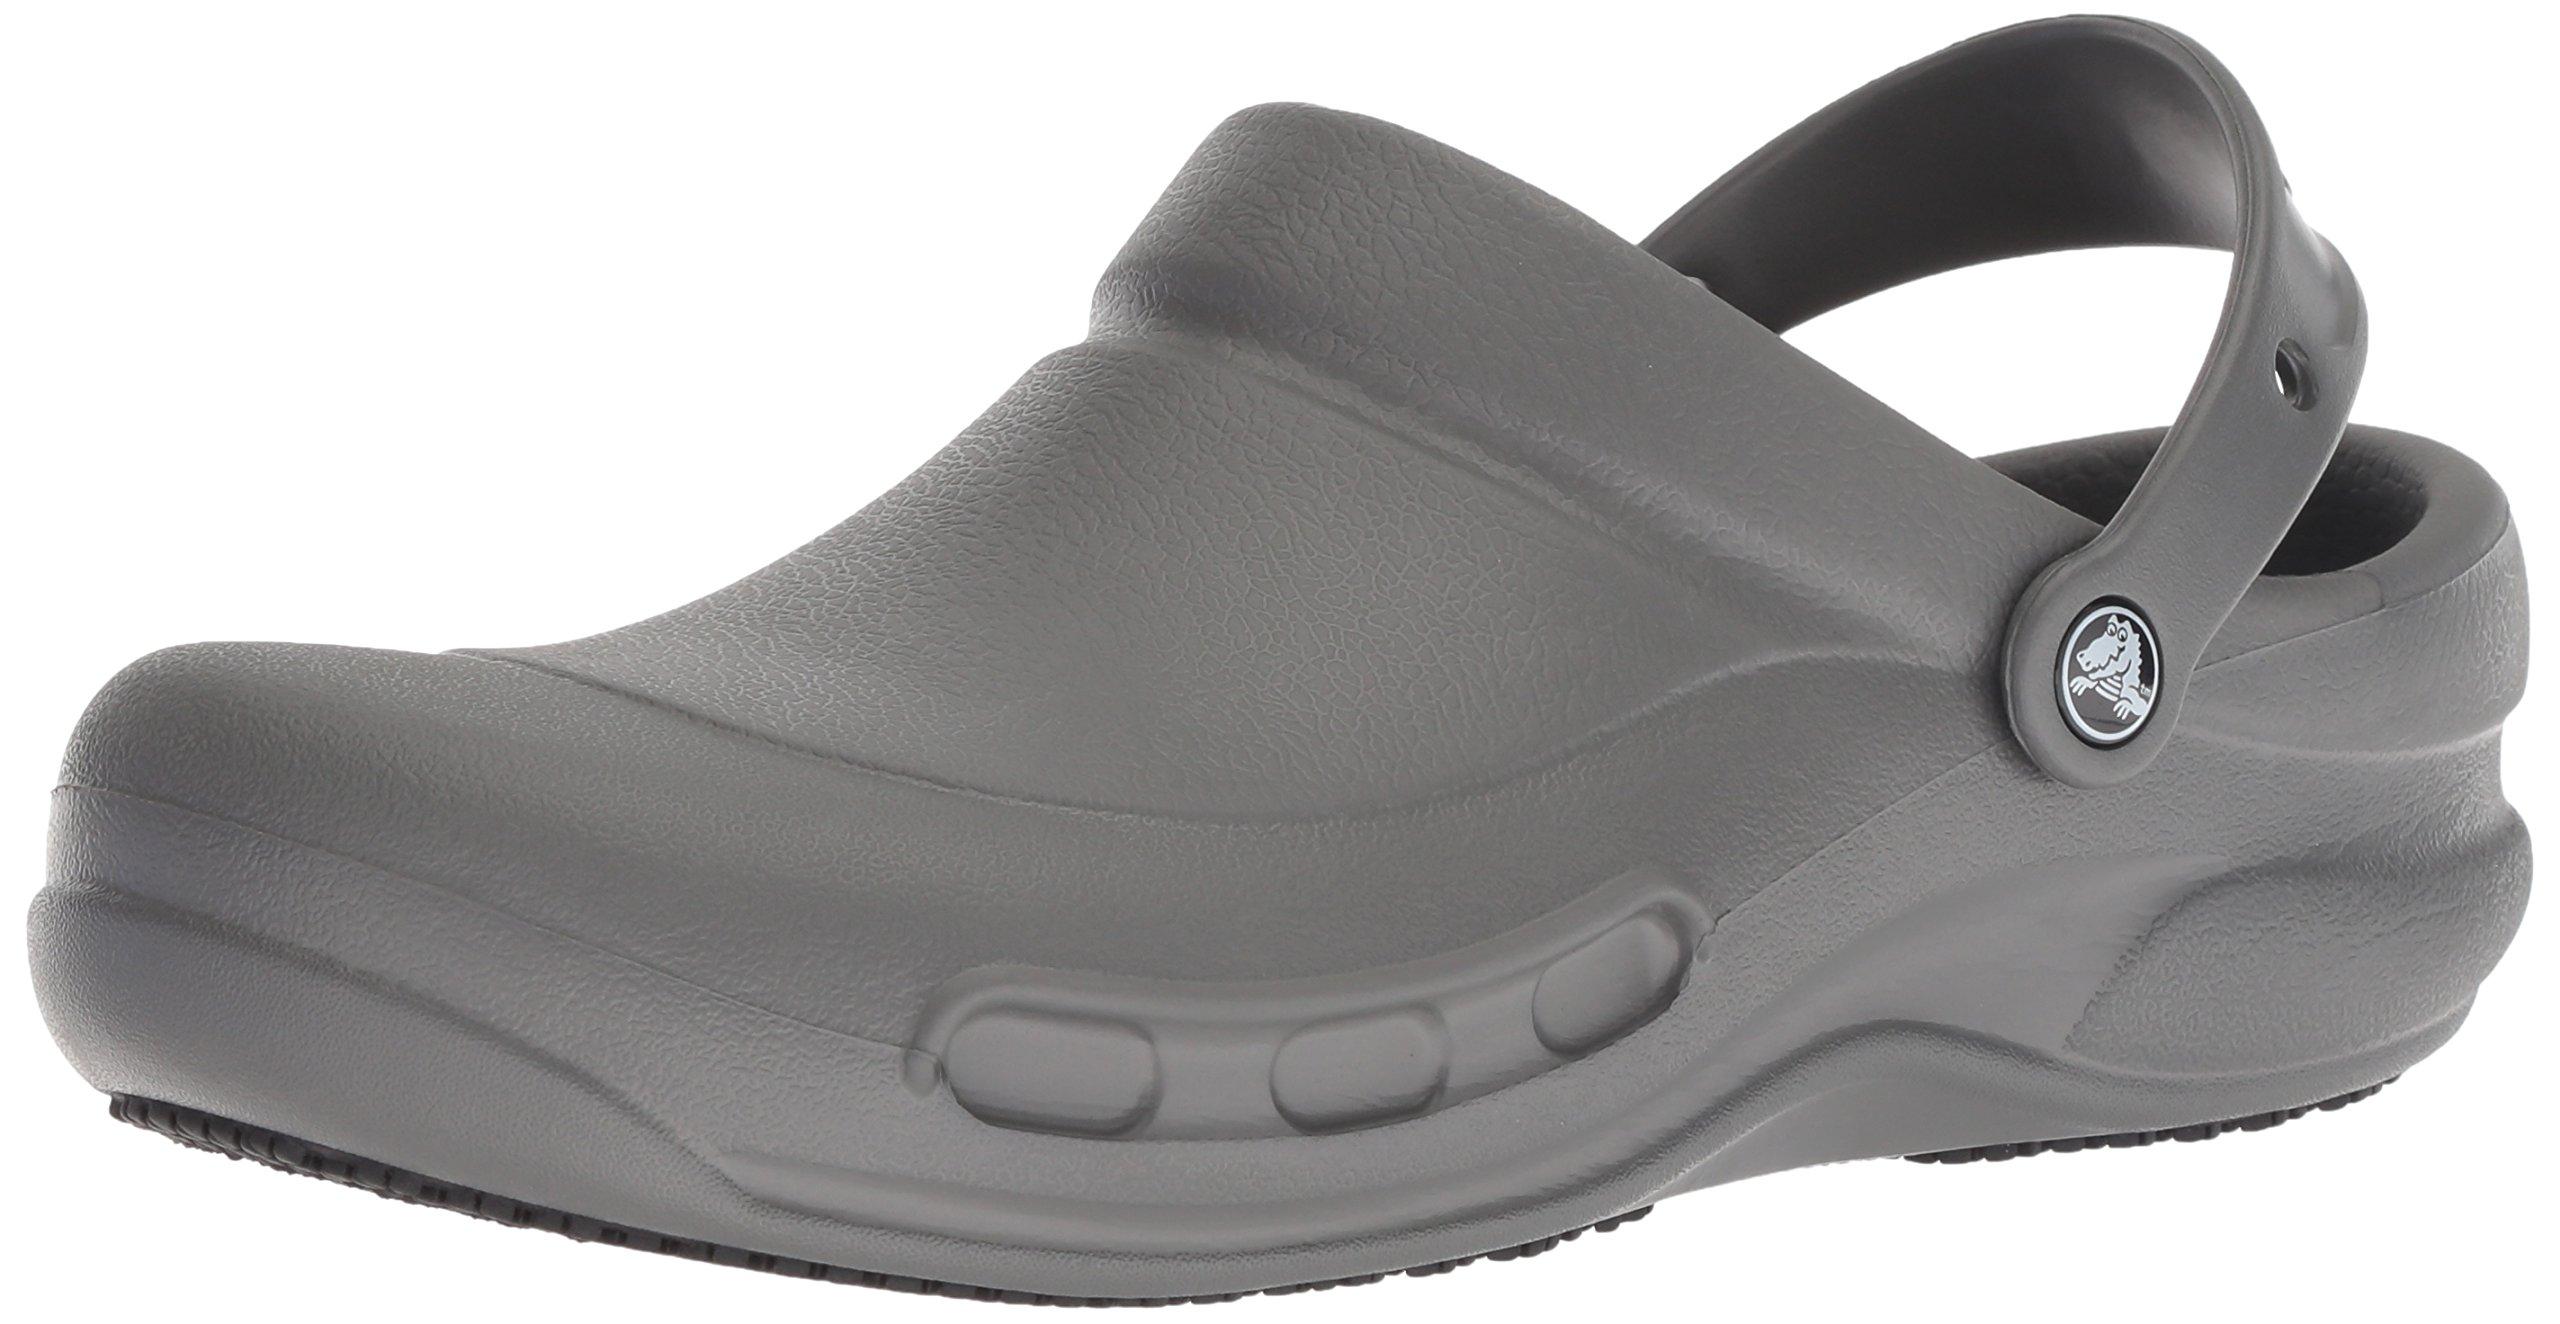 Crocs Men's and Women's Bistro Clog Slip Resistant Work Shoe, Great Nursing or Chef Shoe